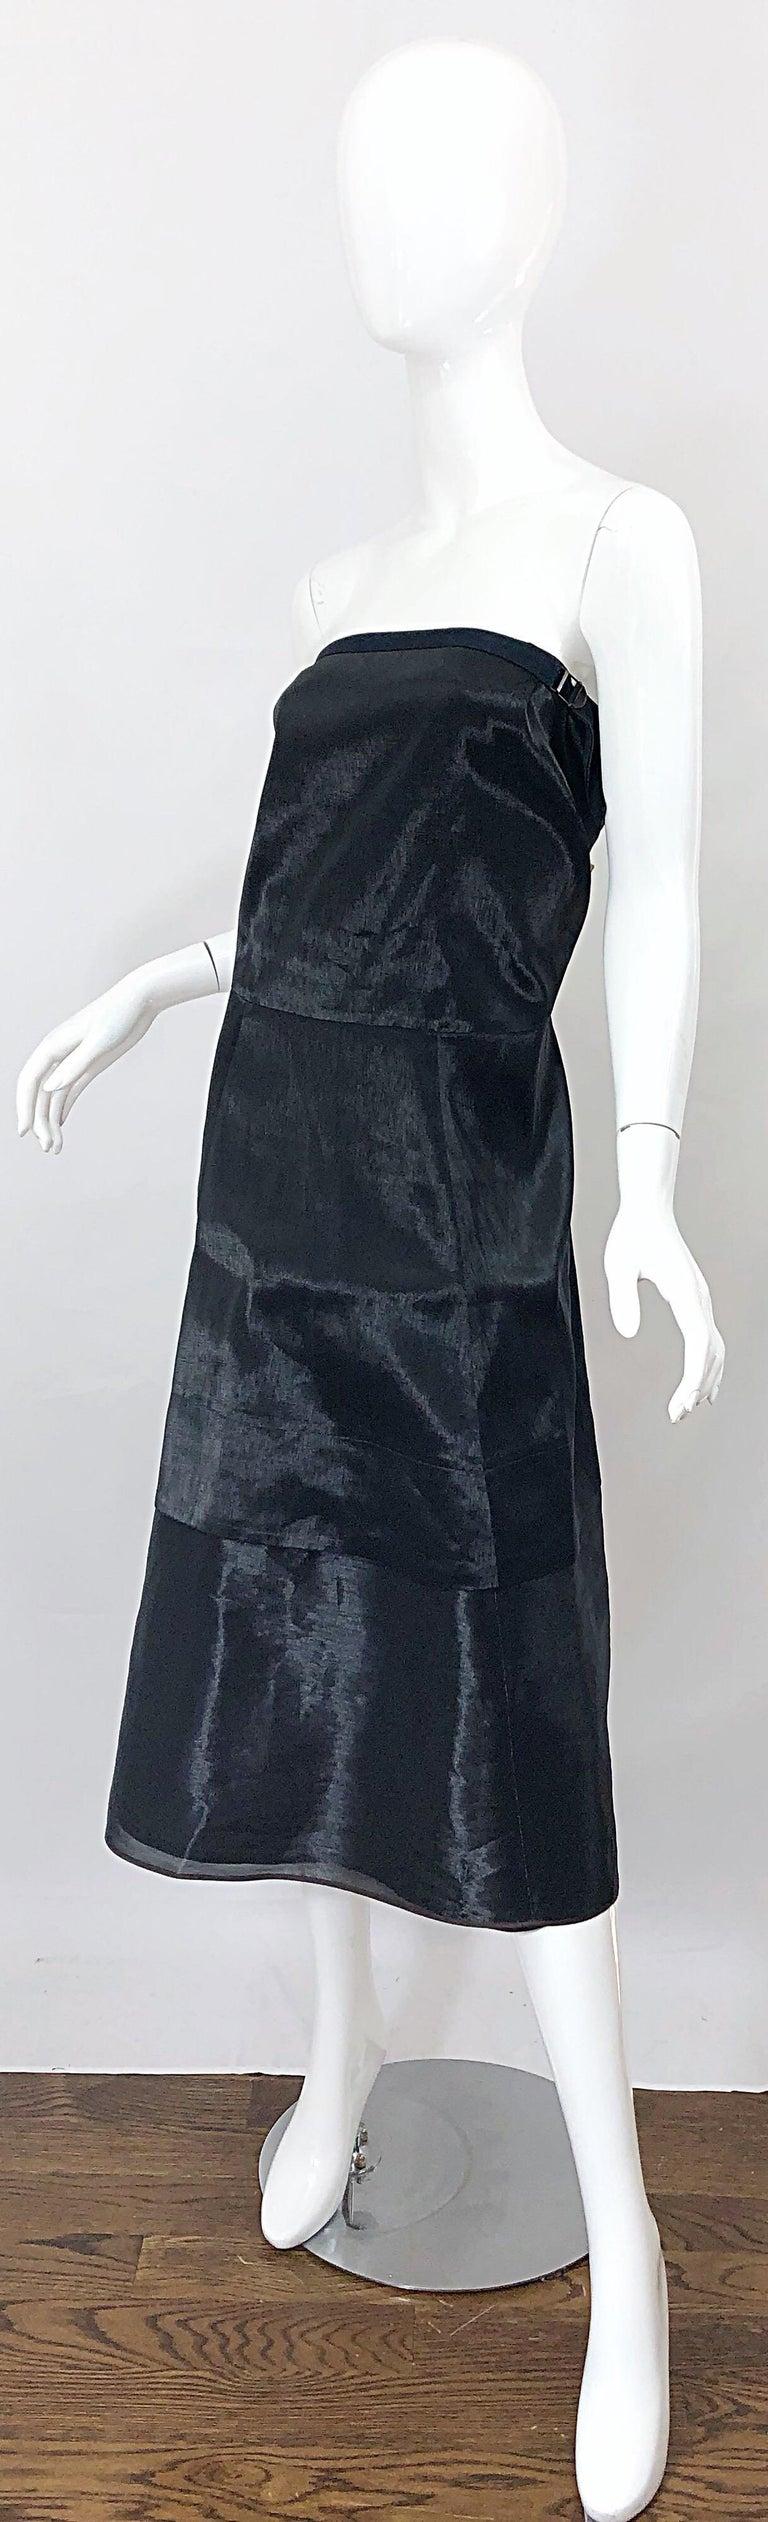 Jil Sander Size 8 Vintage Black Metallic Avant Garde Strapless 1990s Dress 90s For Sale 4